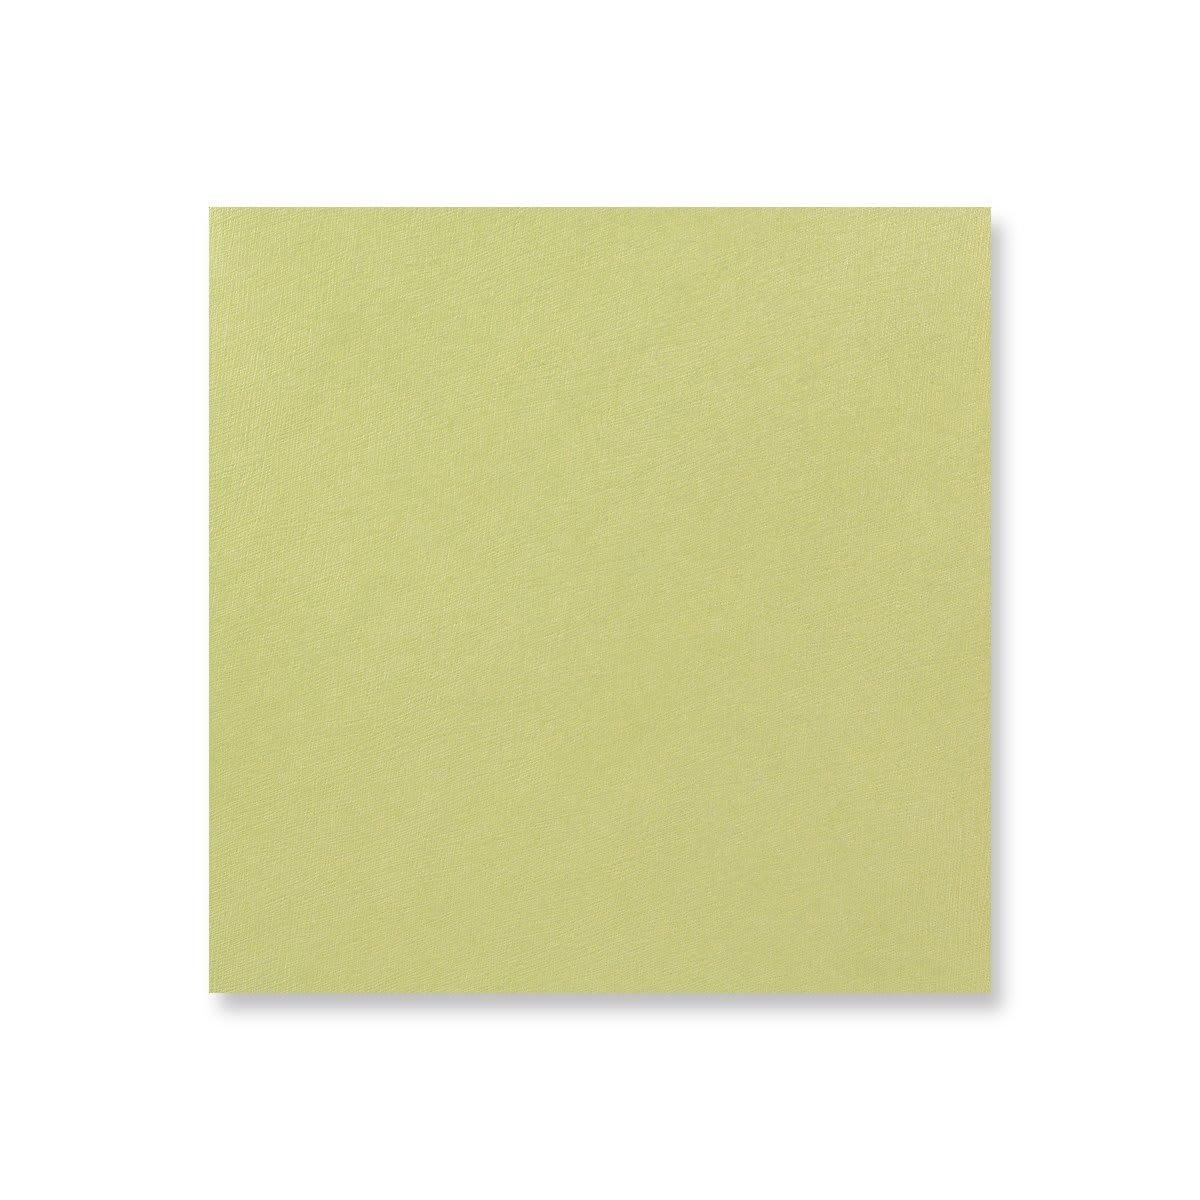 145 x 145mm BEAN GREEN POUCHETTES